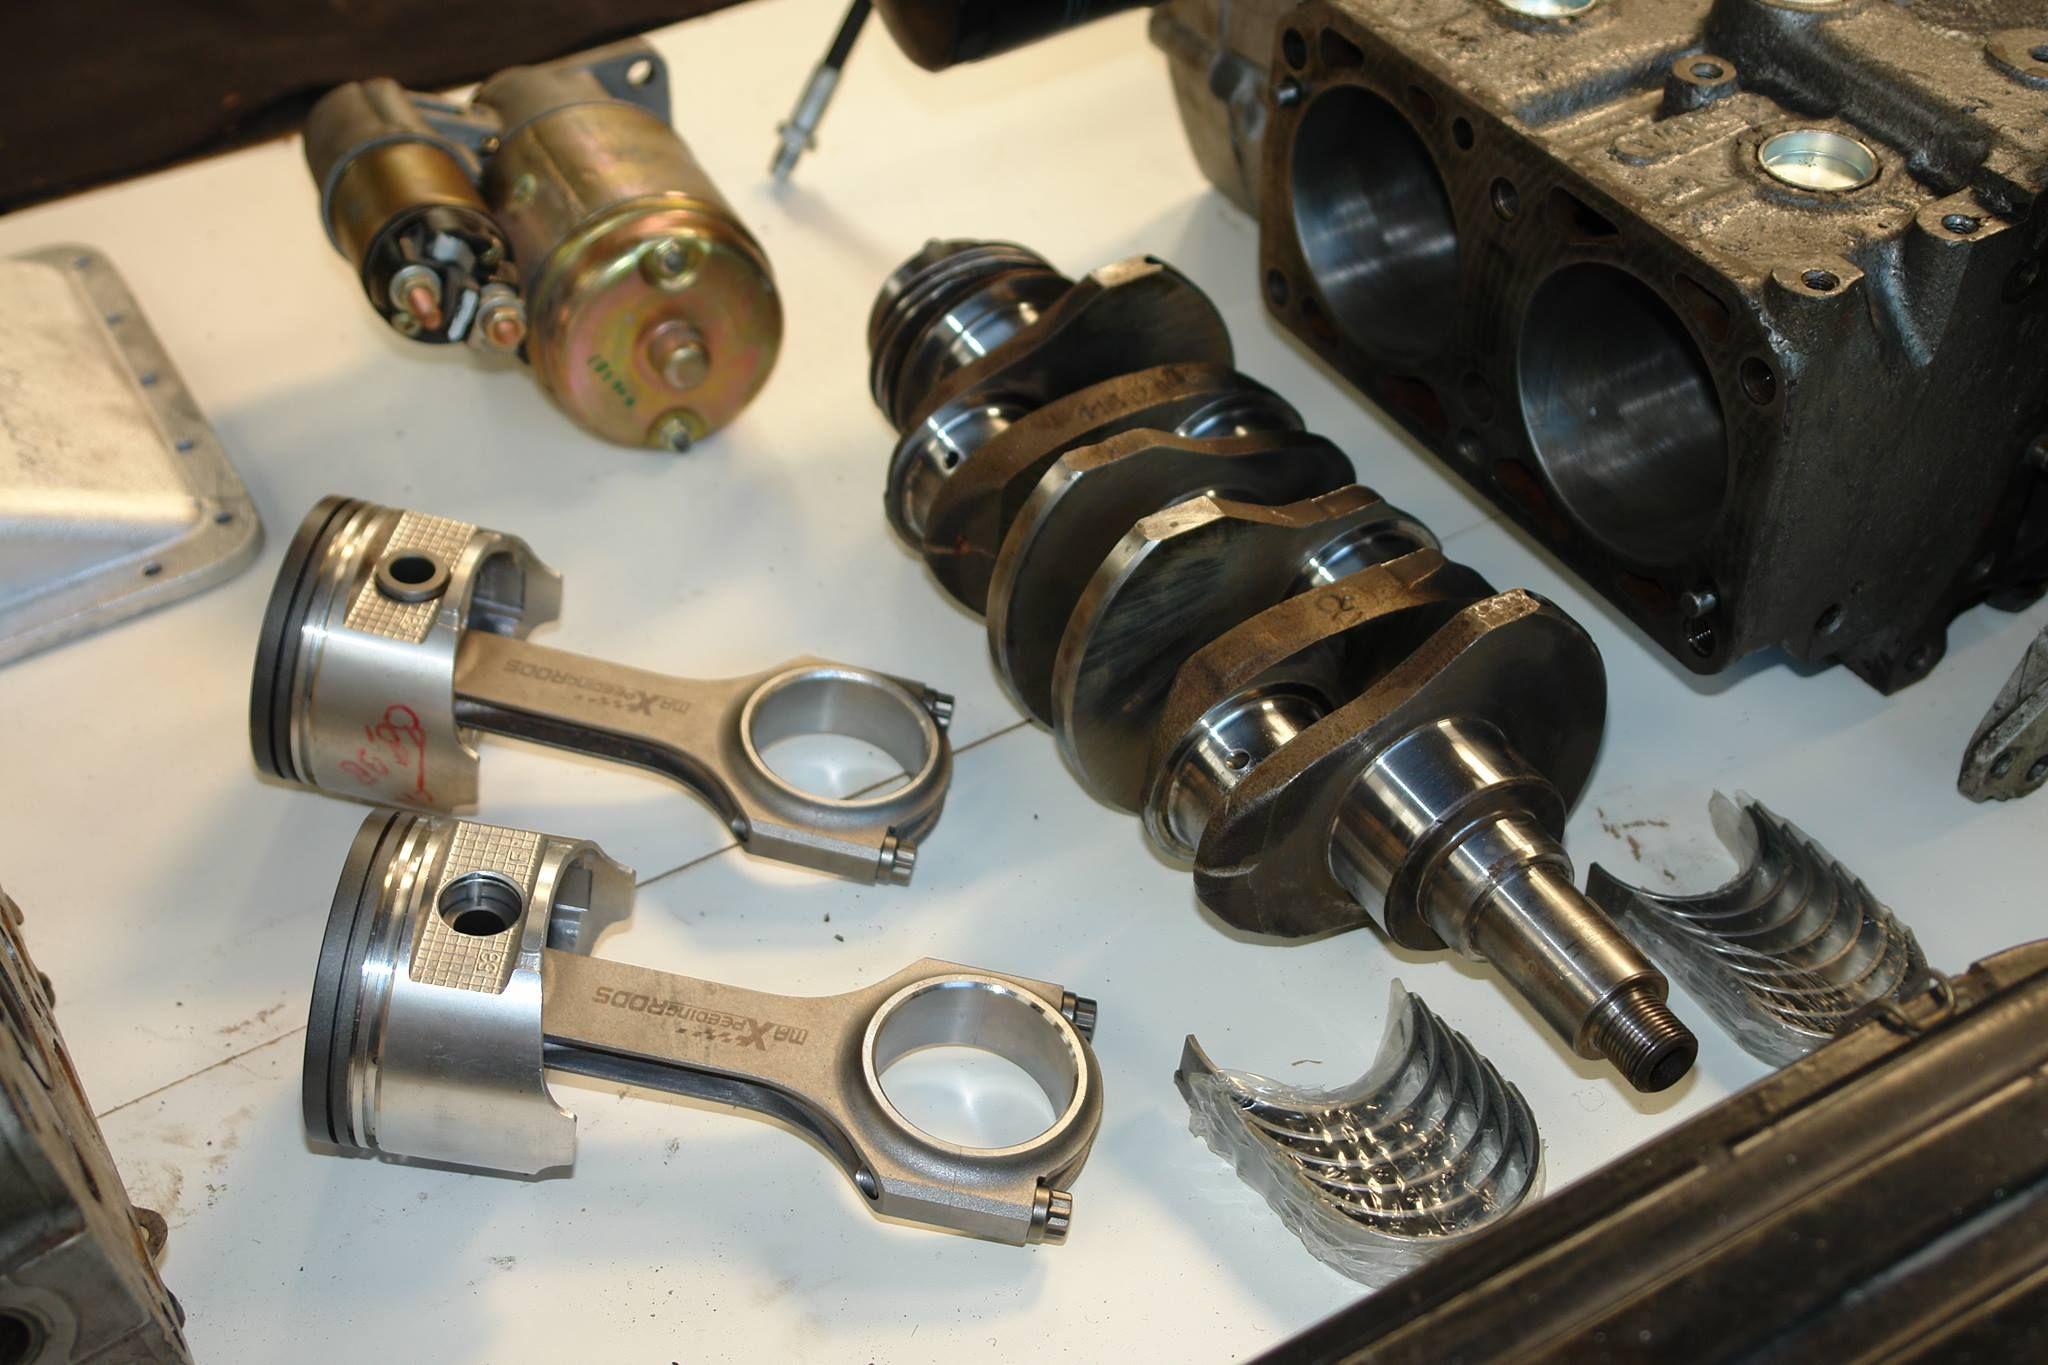 Datsun 510 1600 1 6l L16 133mm Connecting Rod High Performance 4340 En24 H Beam Conrod Beams Datsun Performance Auto Parts